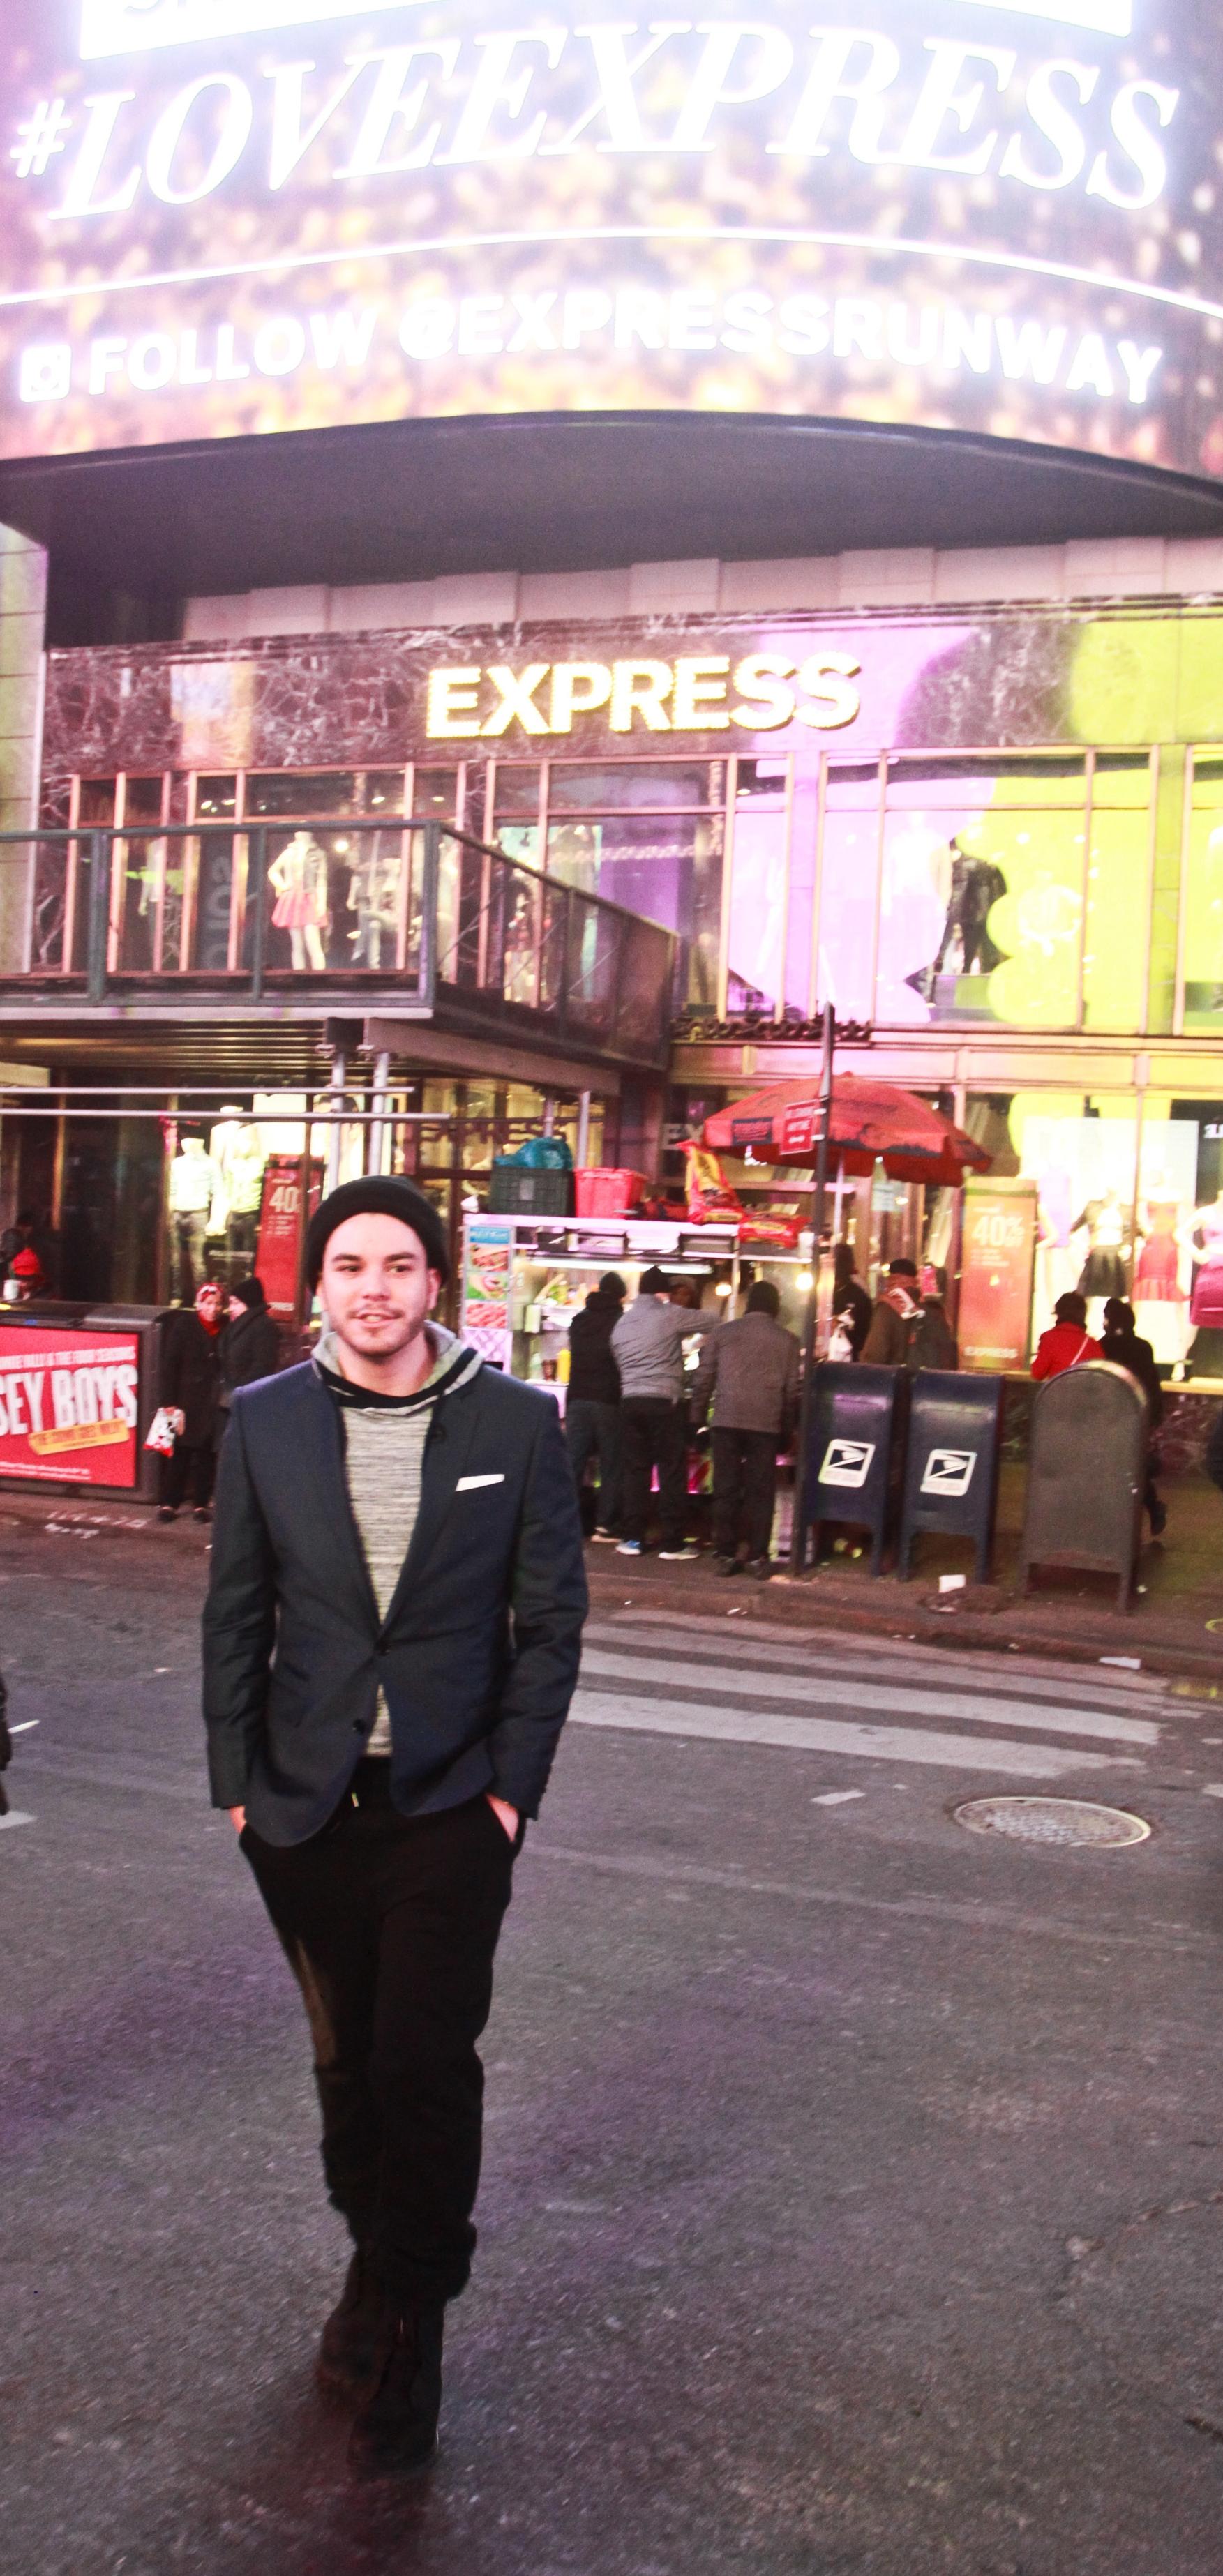 Grungy Gentleman Times Square NYC billboard 3.JPG